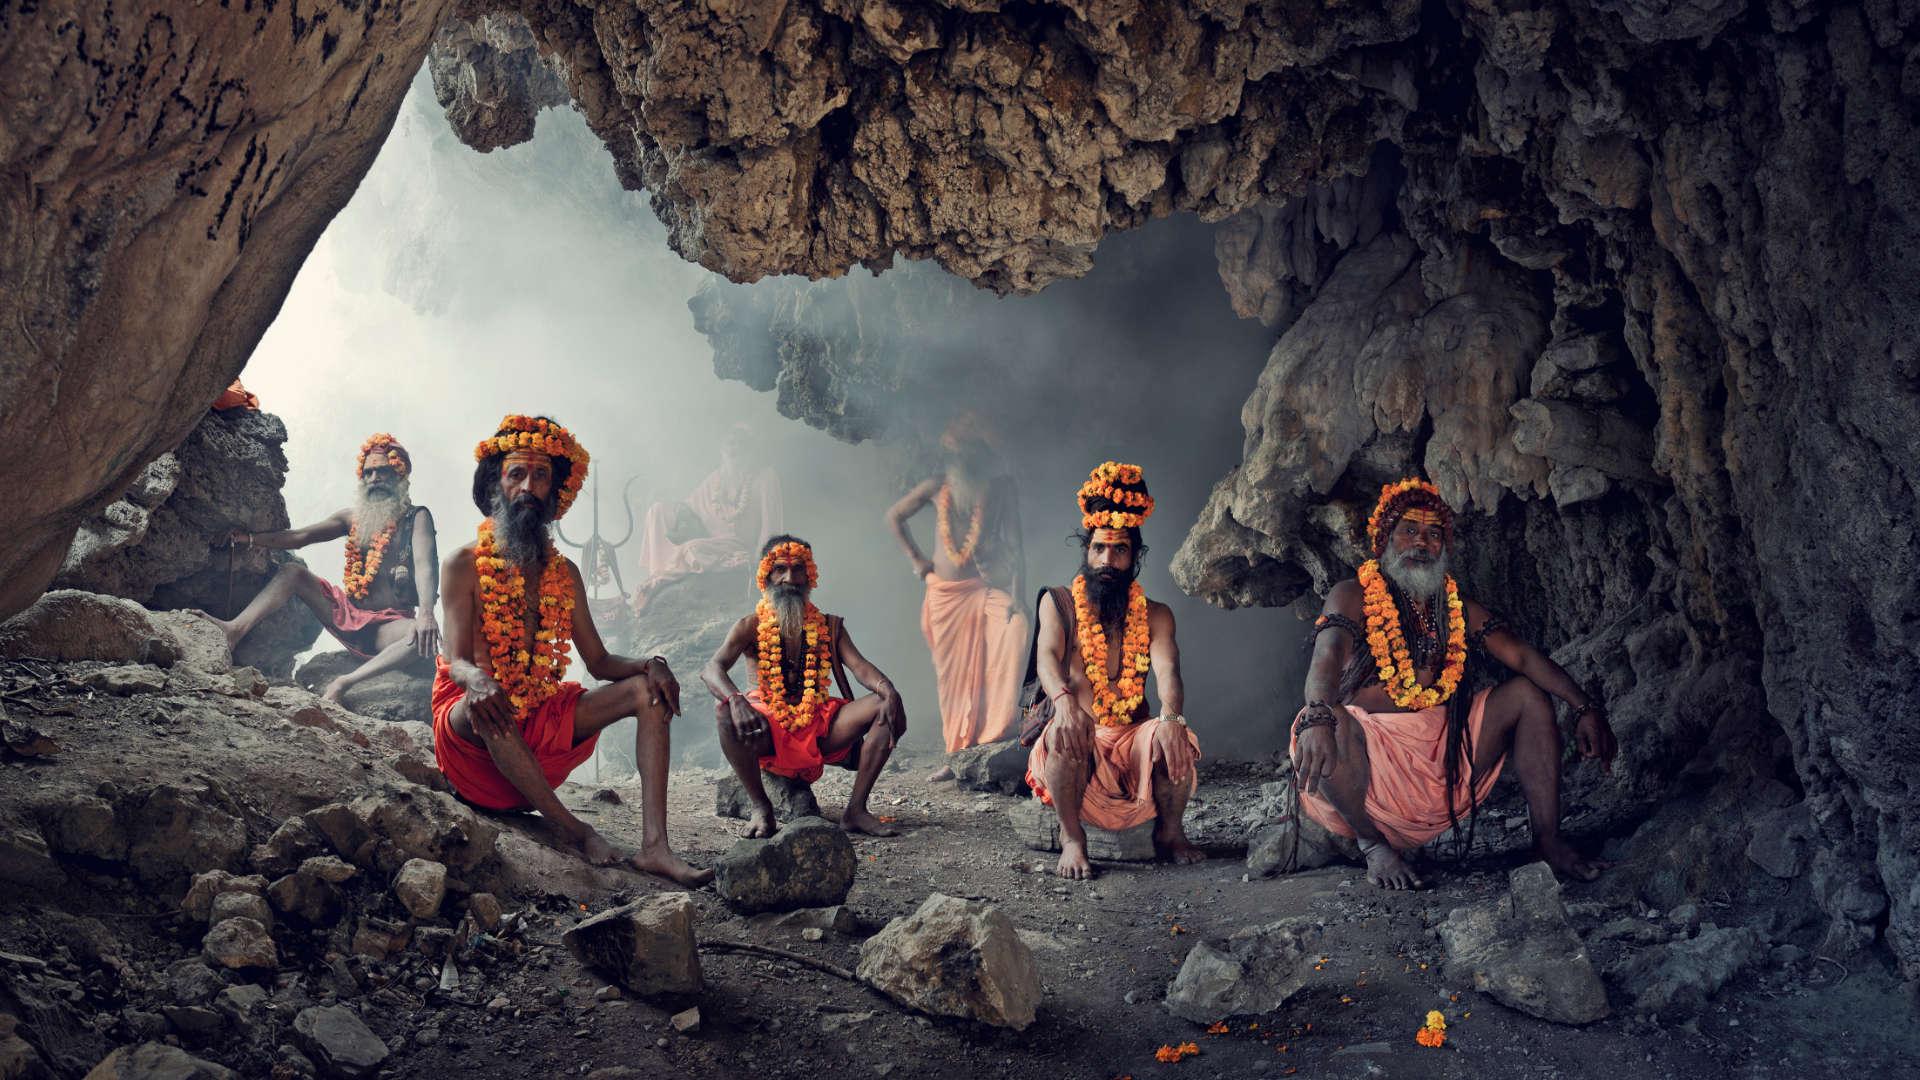 Sadhu stam, Haridwar, India